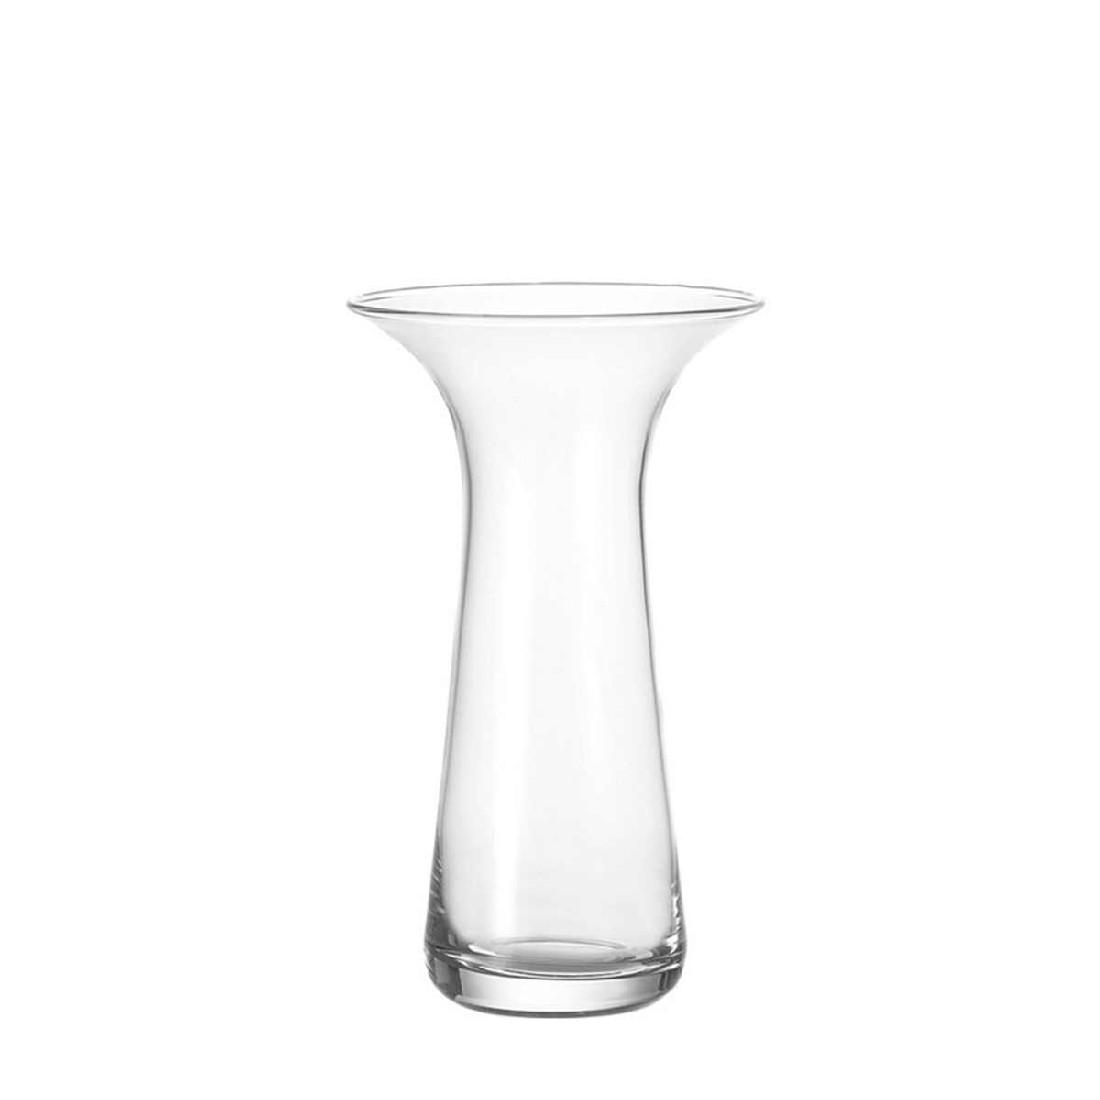 Vase Fluent – 29 cm, Leonardo online kaufen